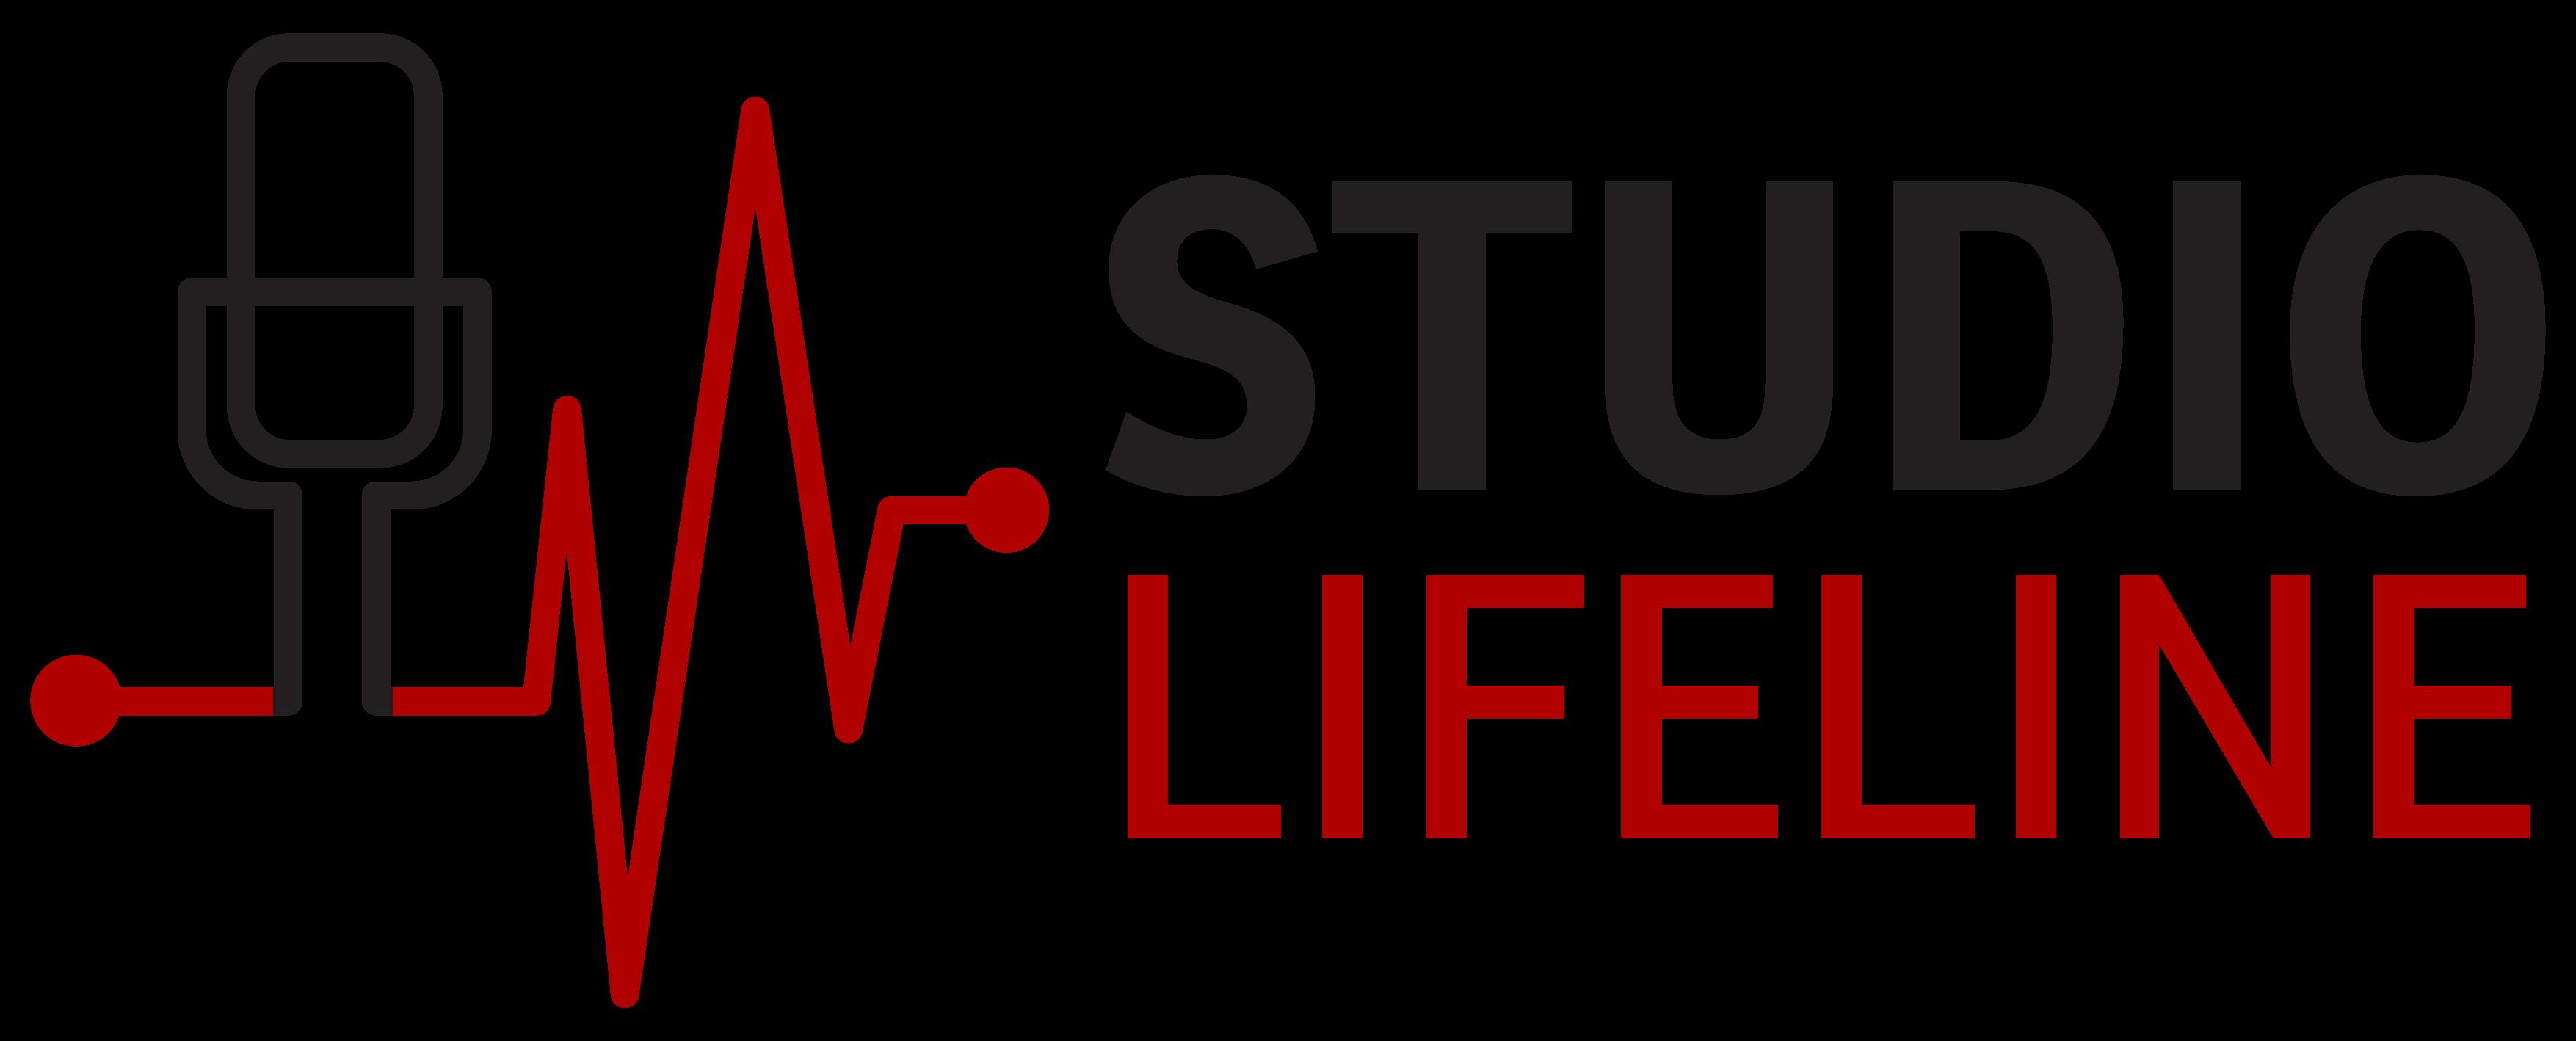 Studio Lifeline logo